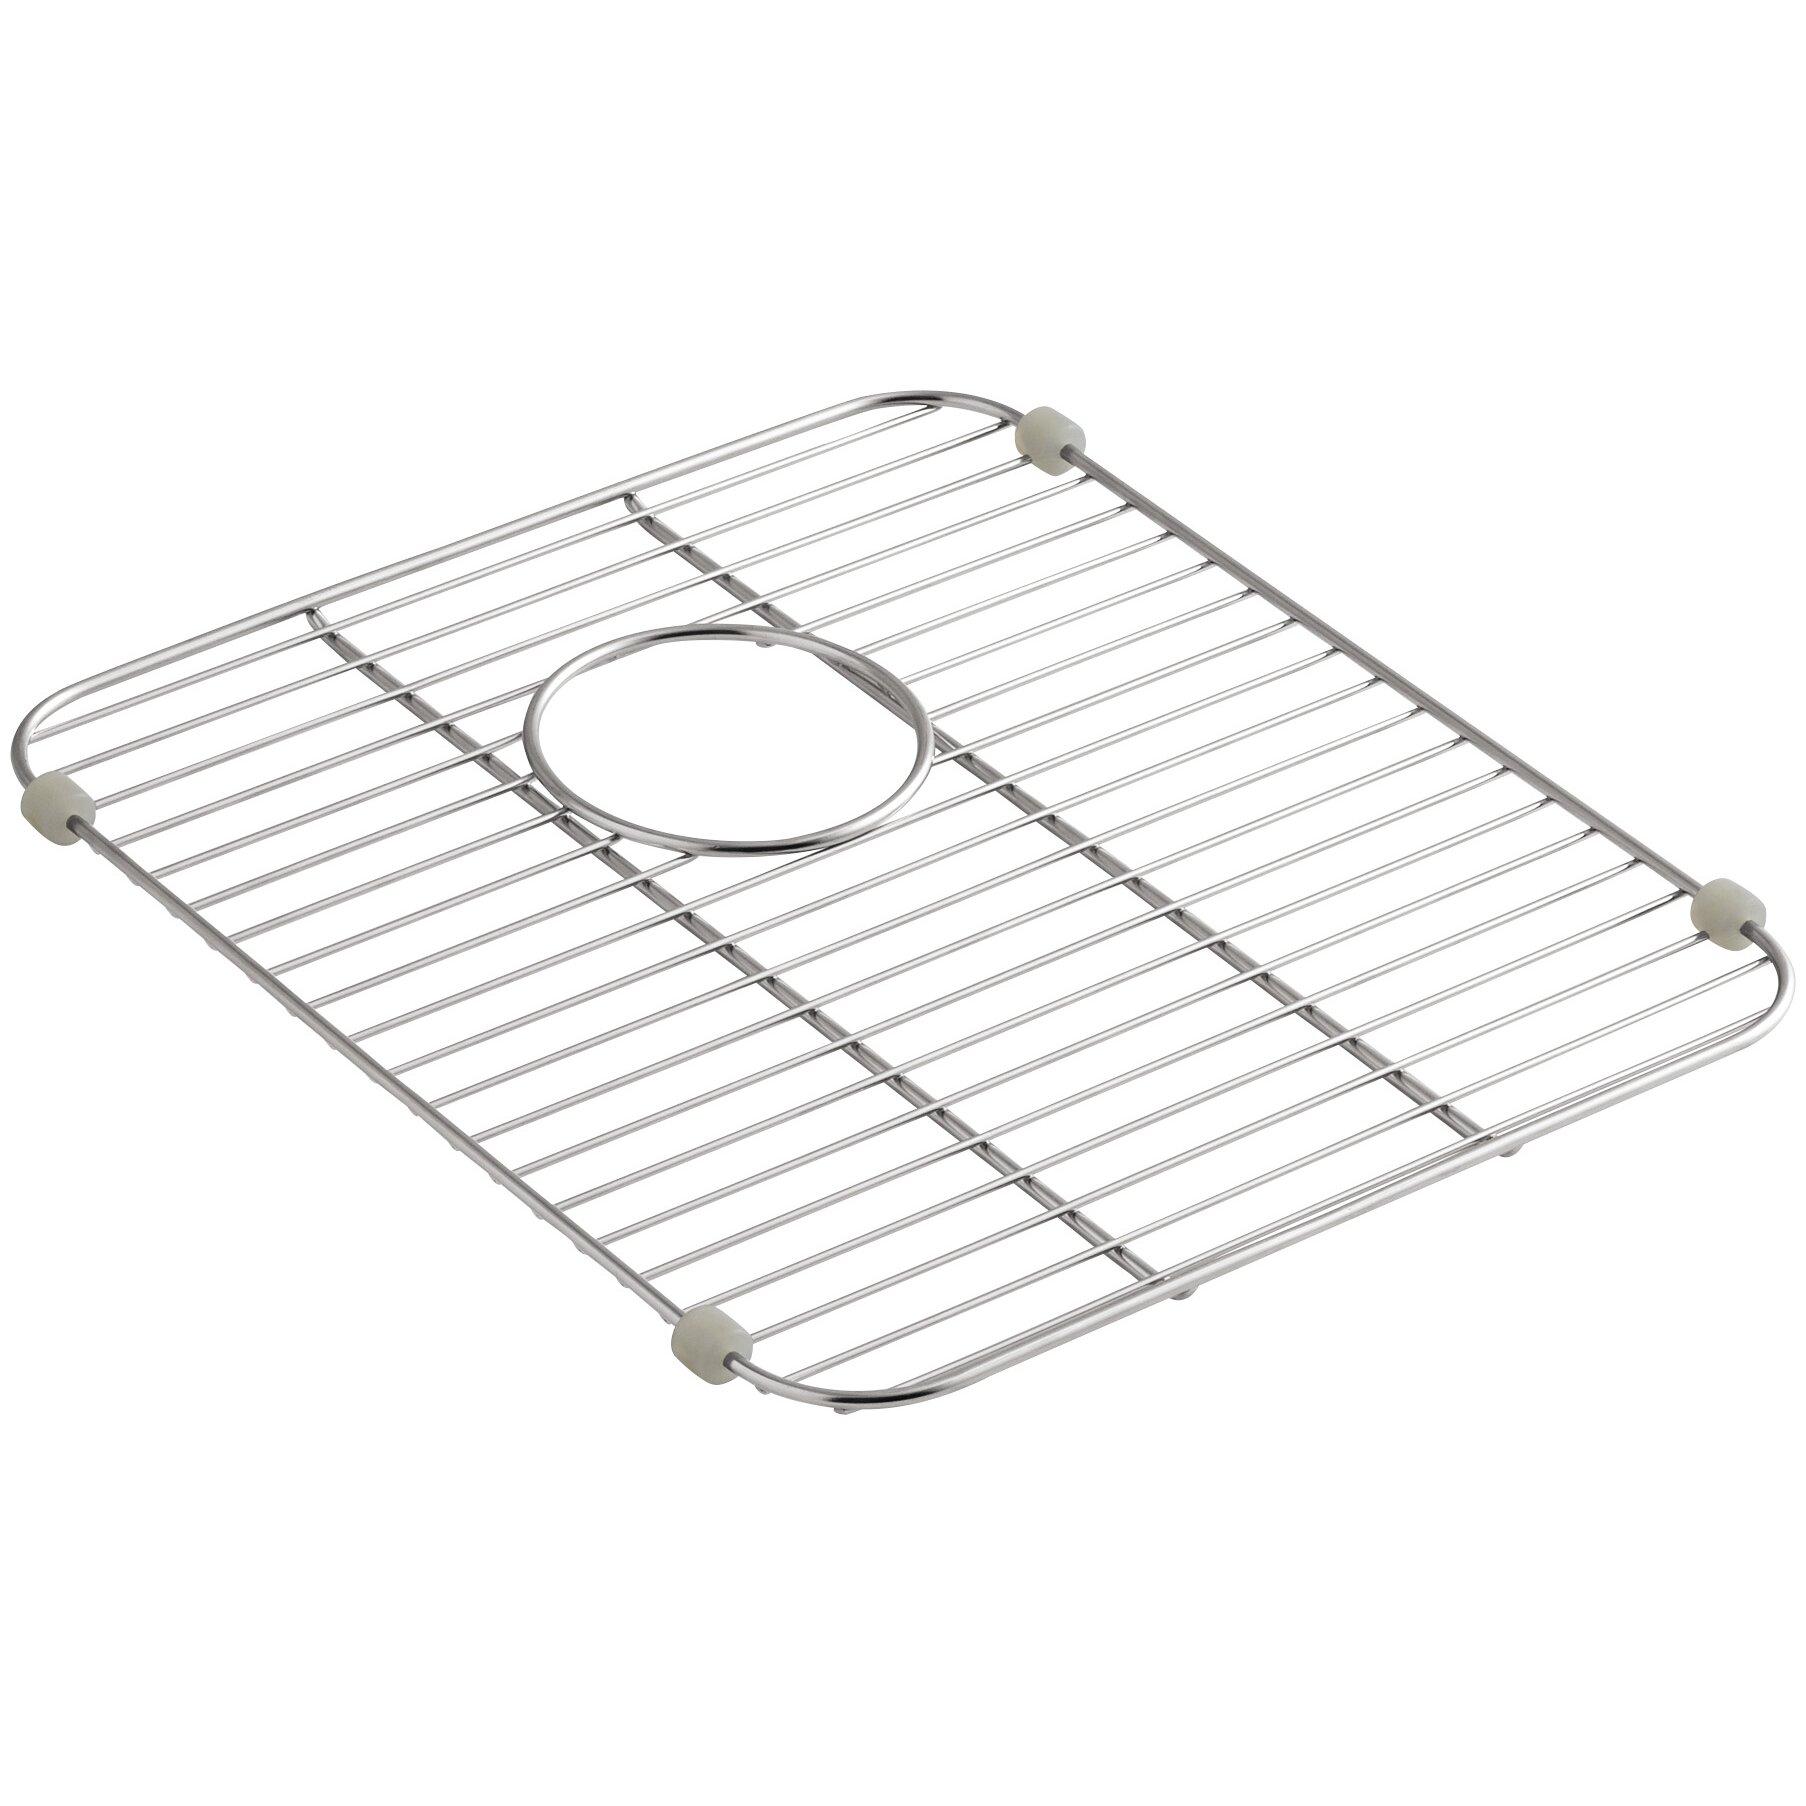 stainless steel sink rack for kitchen sinks wayfair. Black Bedroom Furniture Sets. Home Design Ideas